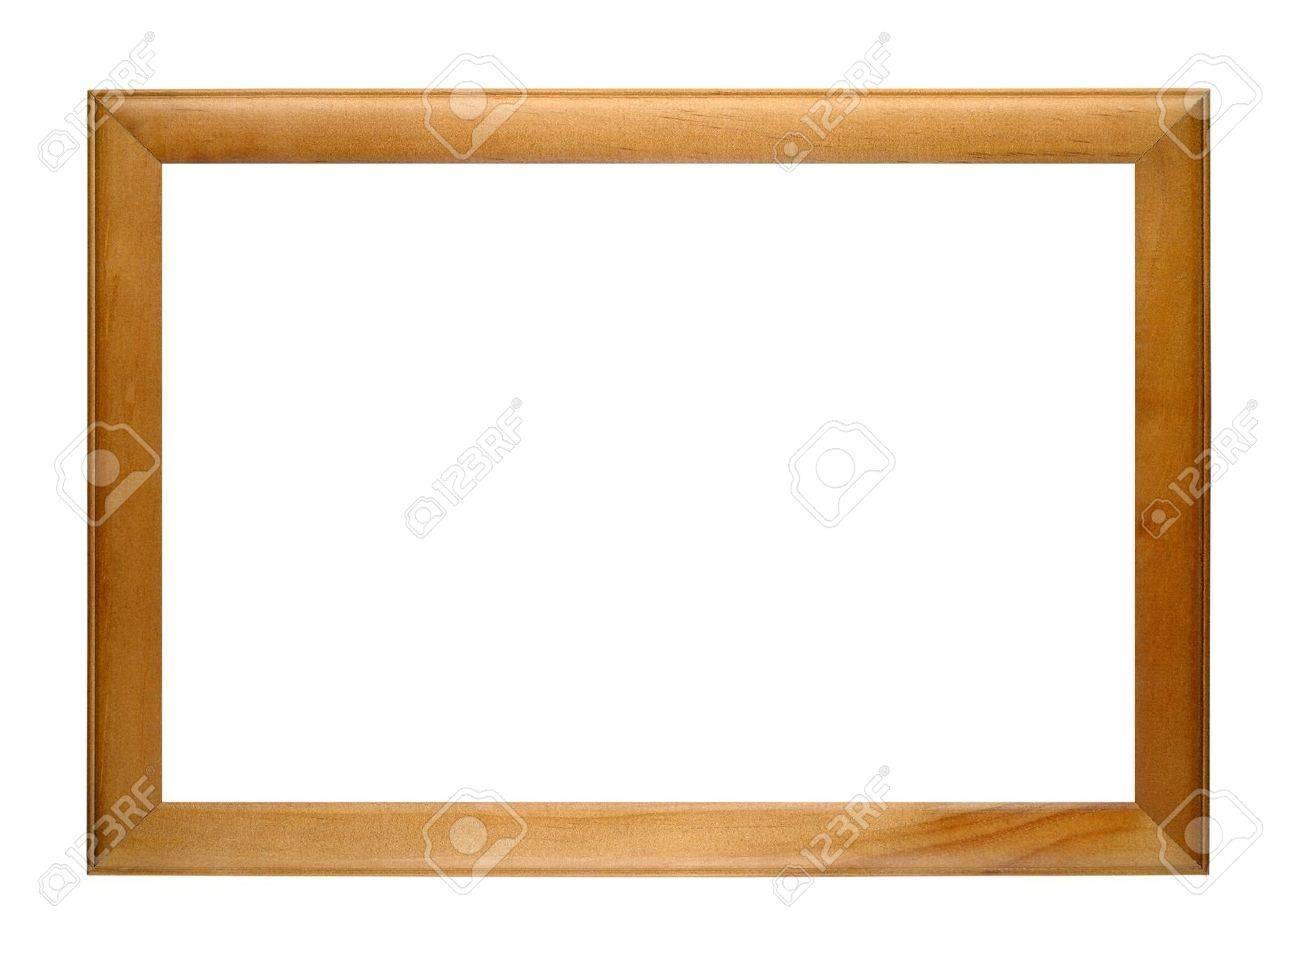 Wooden photo frame isolated on white background - 19105112